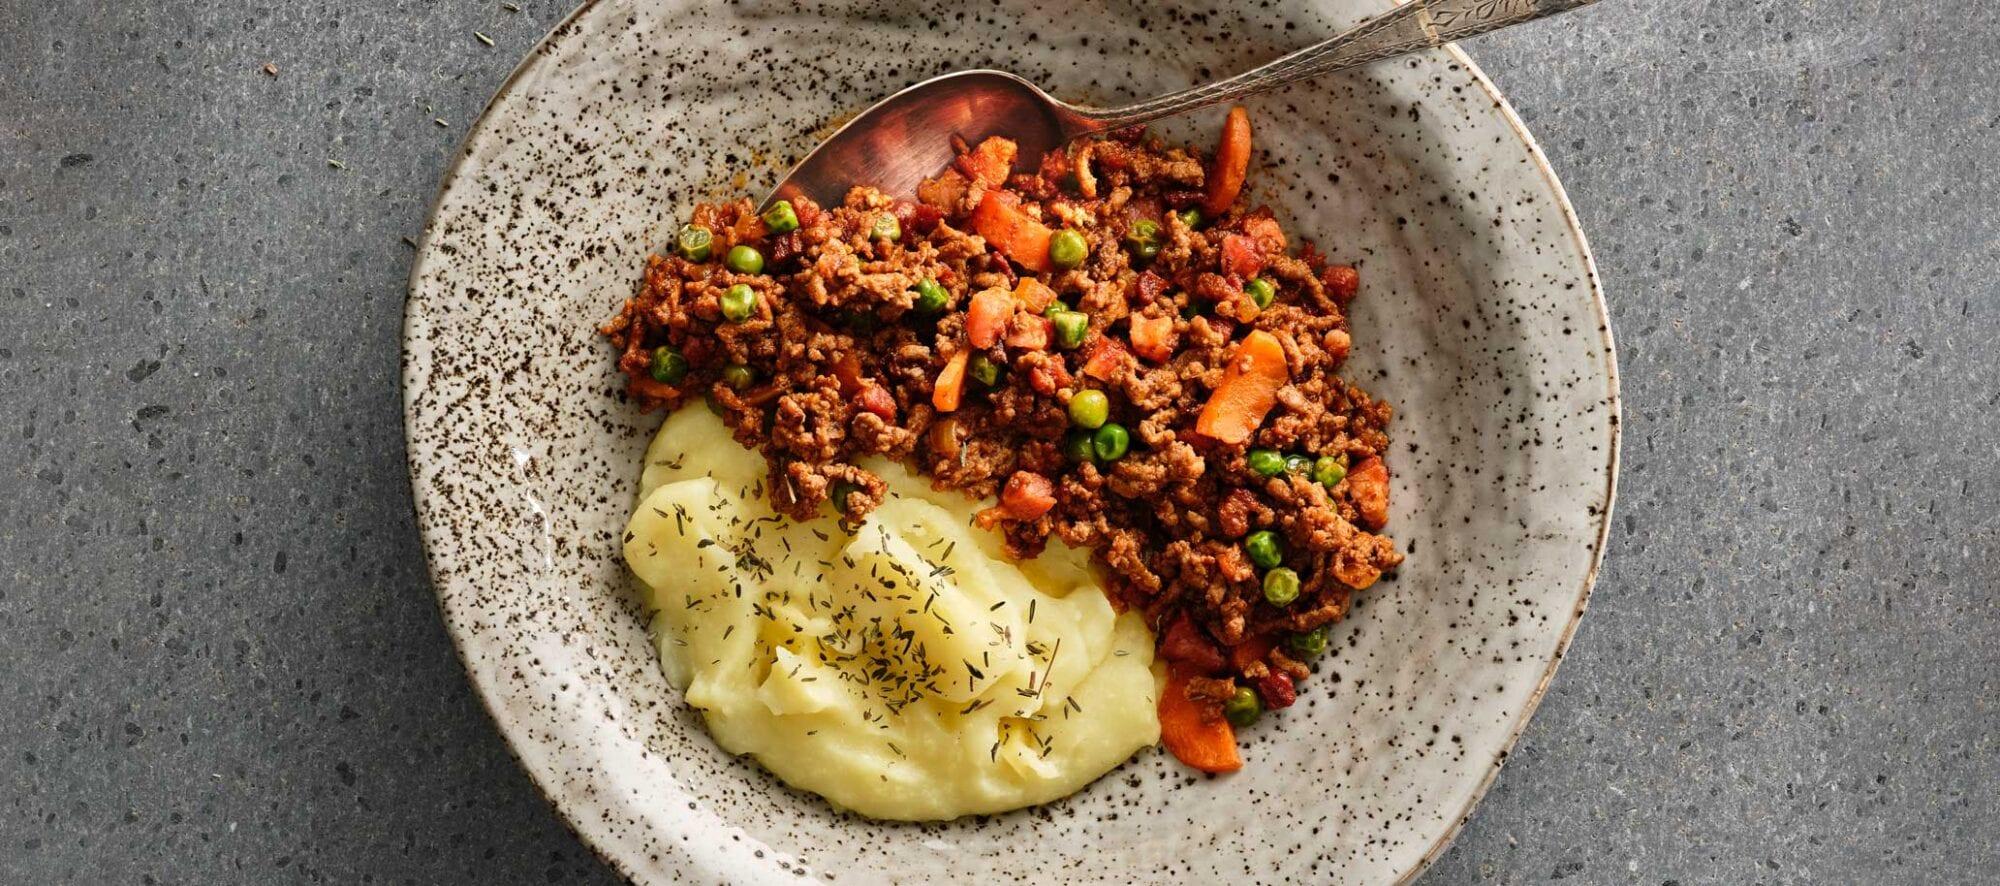 Millionboef med groentsager og kartoffelmos